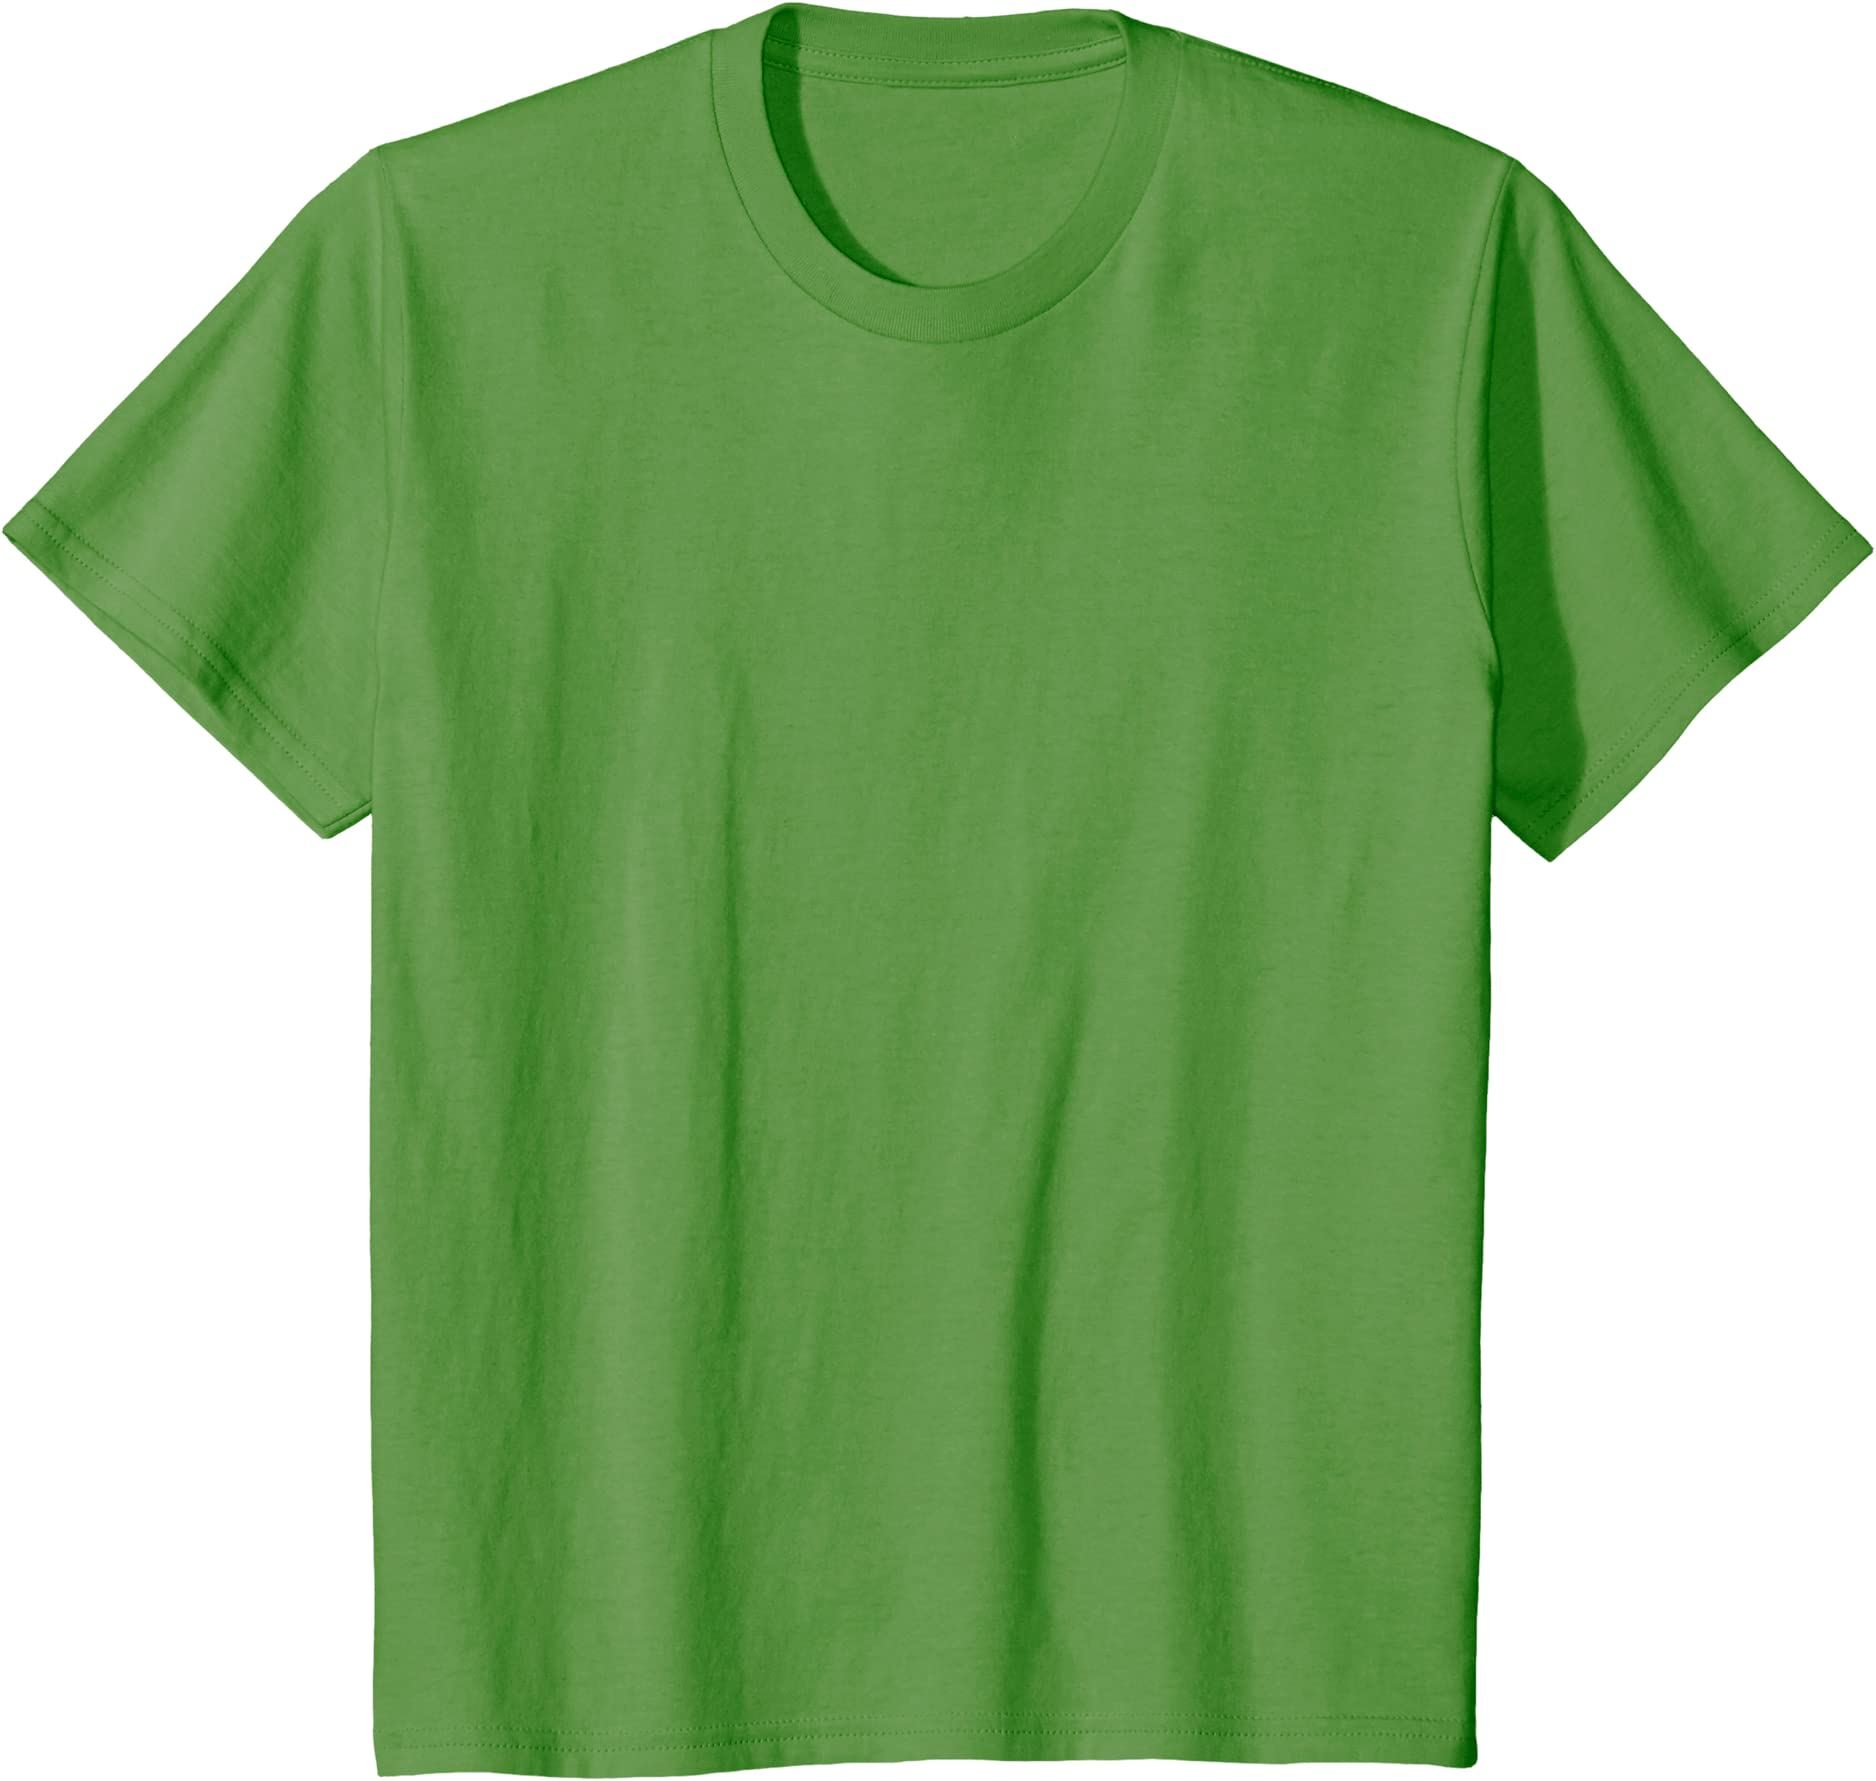 No Fat Chicks Funny Mens T-Shirt 12 Colours